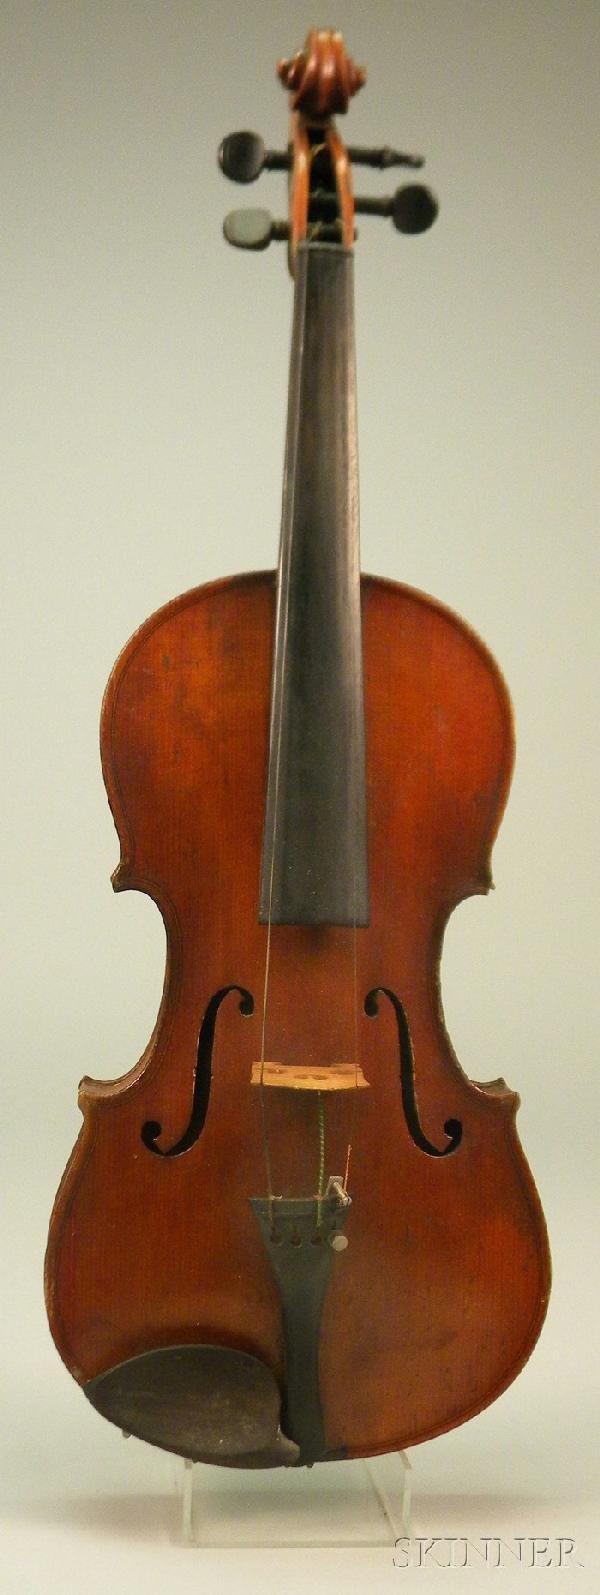 522: German Violin, c. 1900, 360 mm.